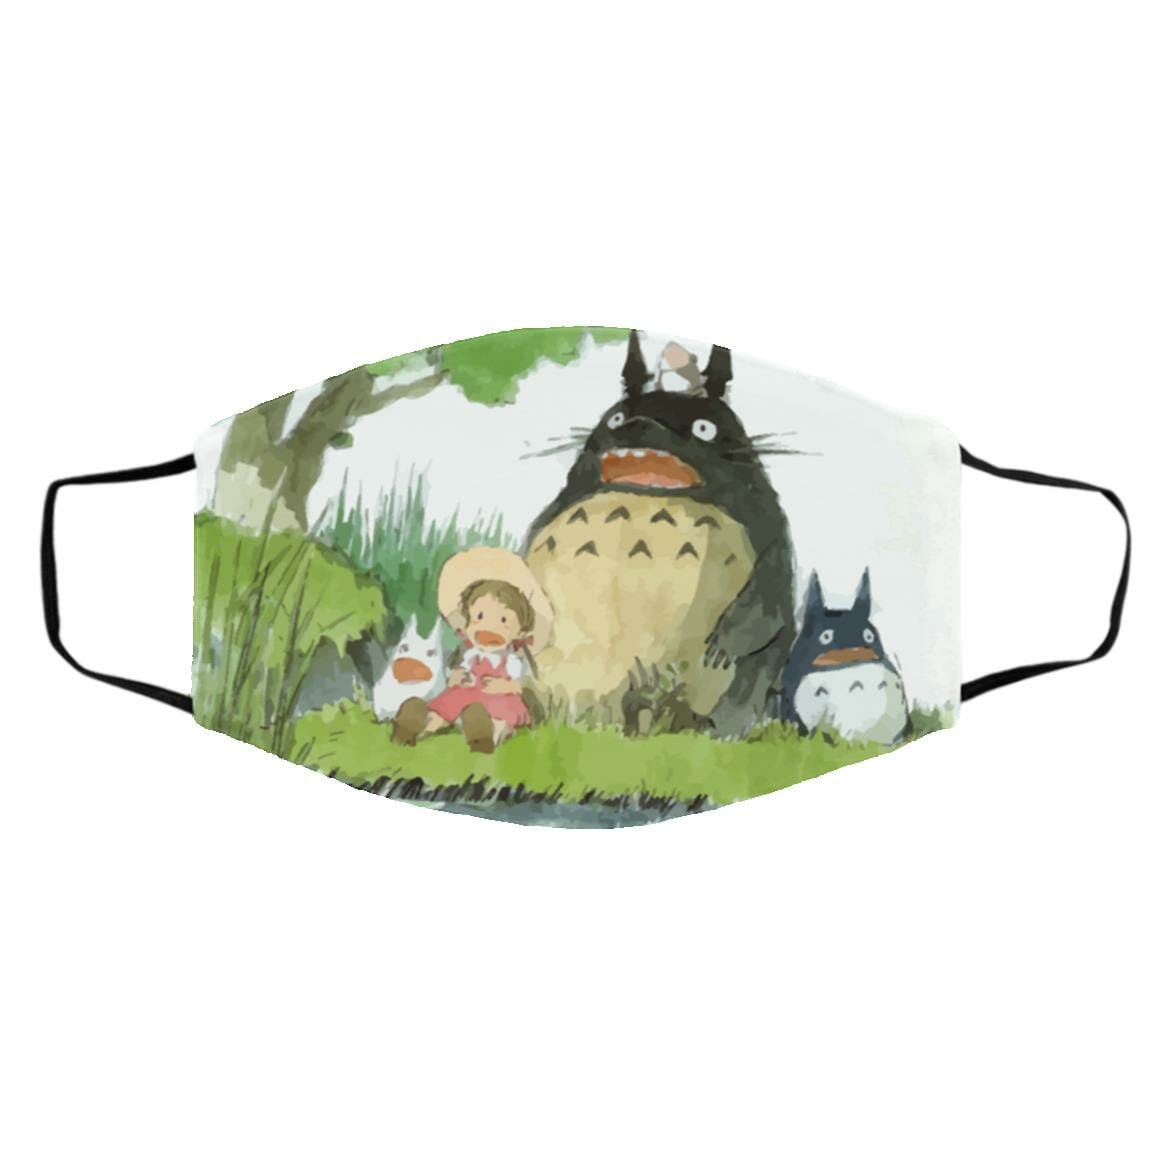 My Neighbor Totoro Picnic Fanart Face Mask